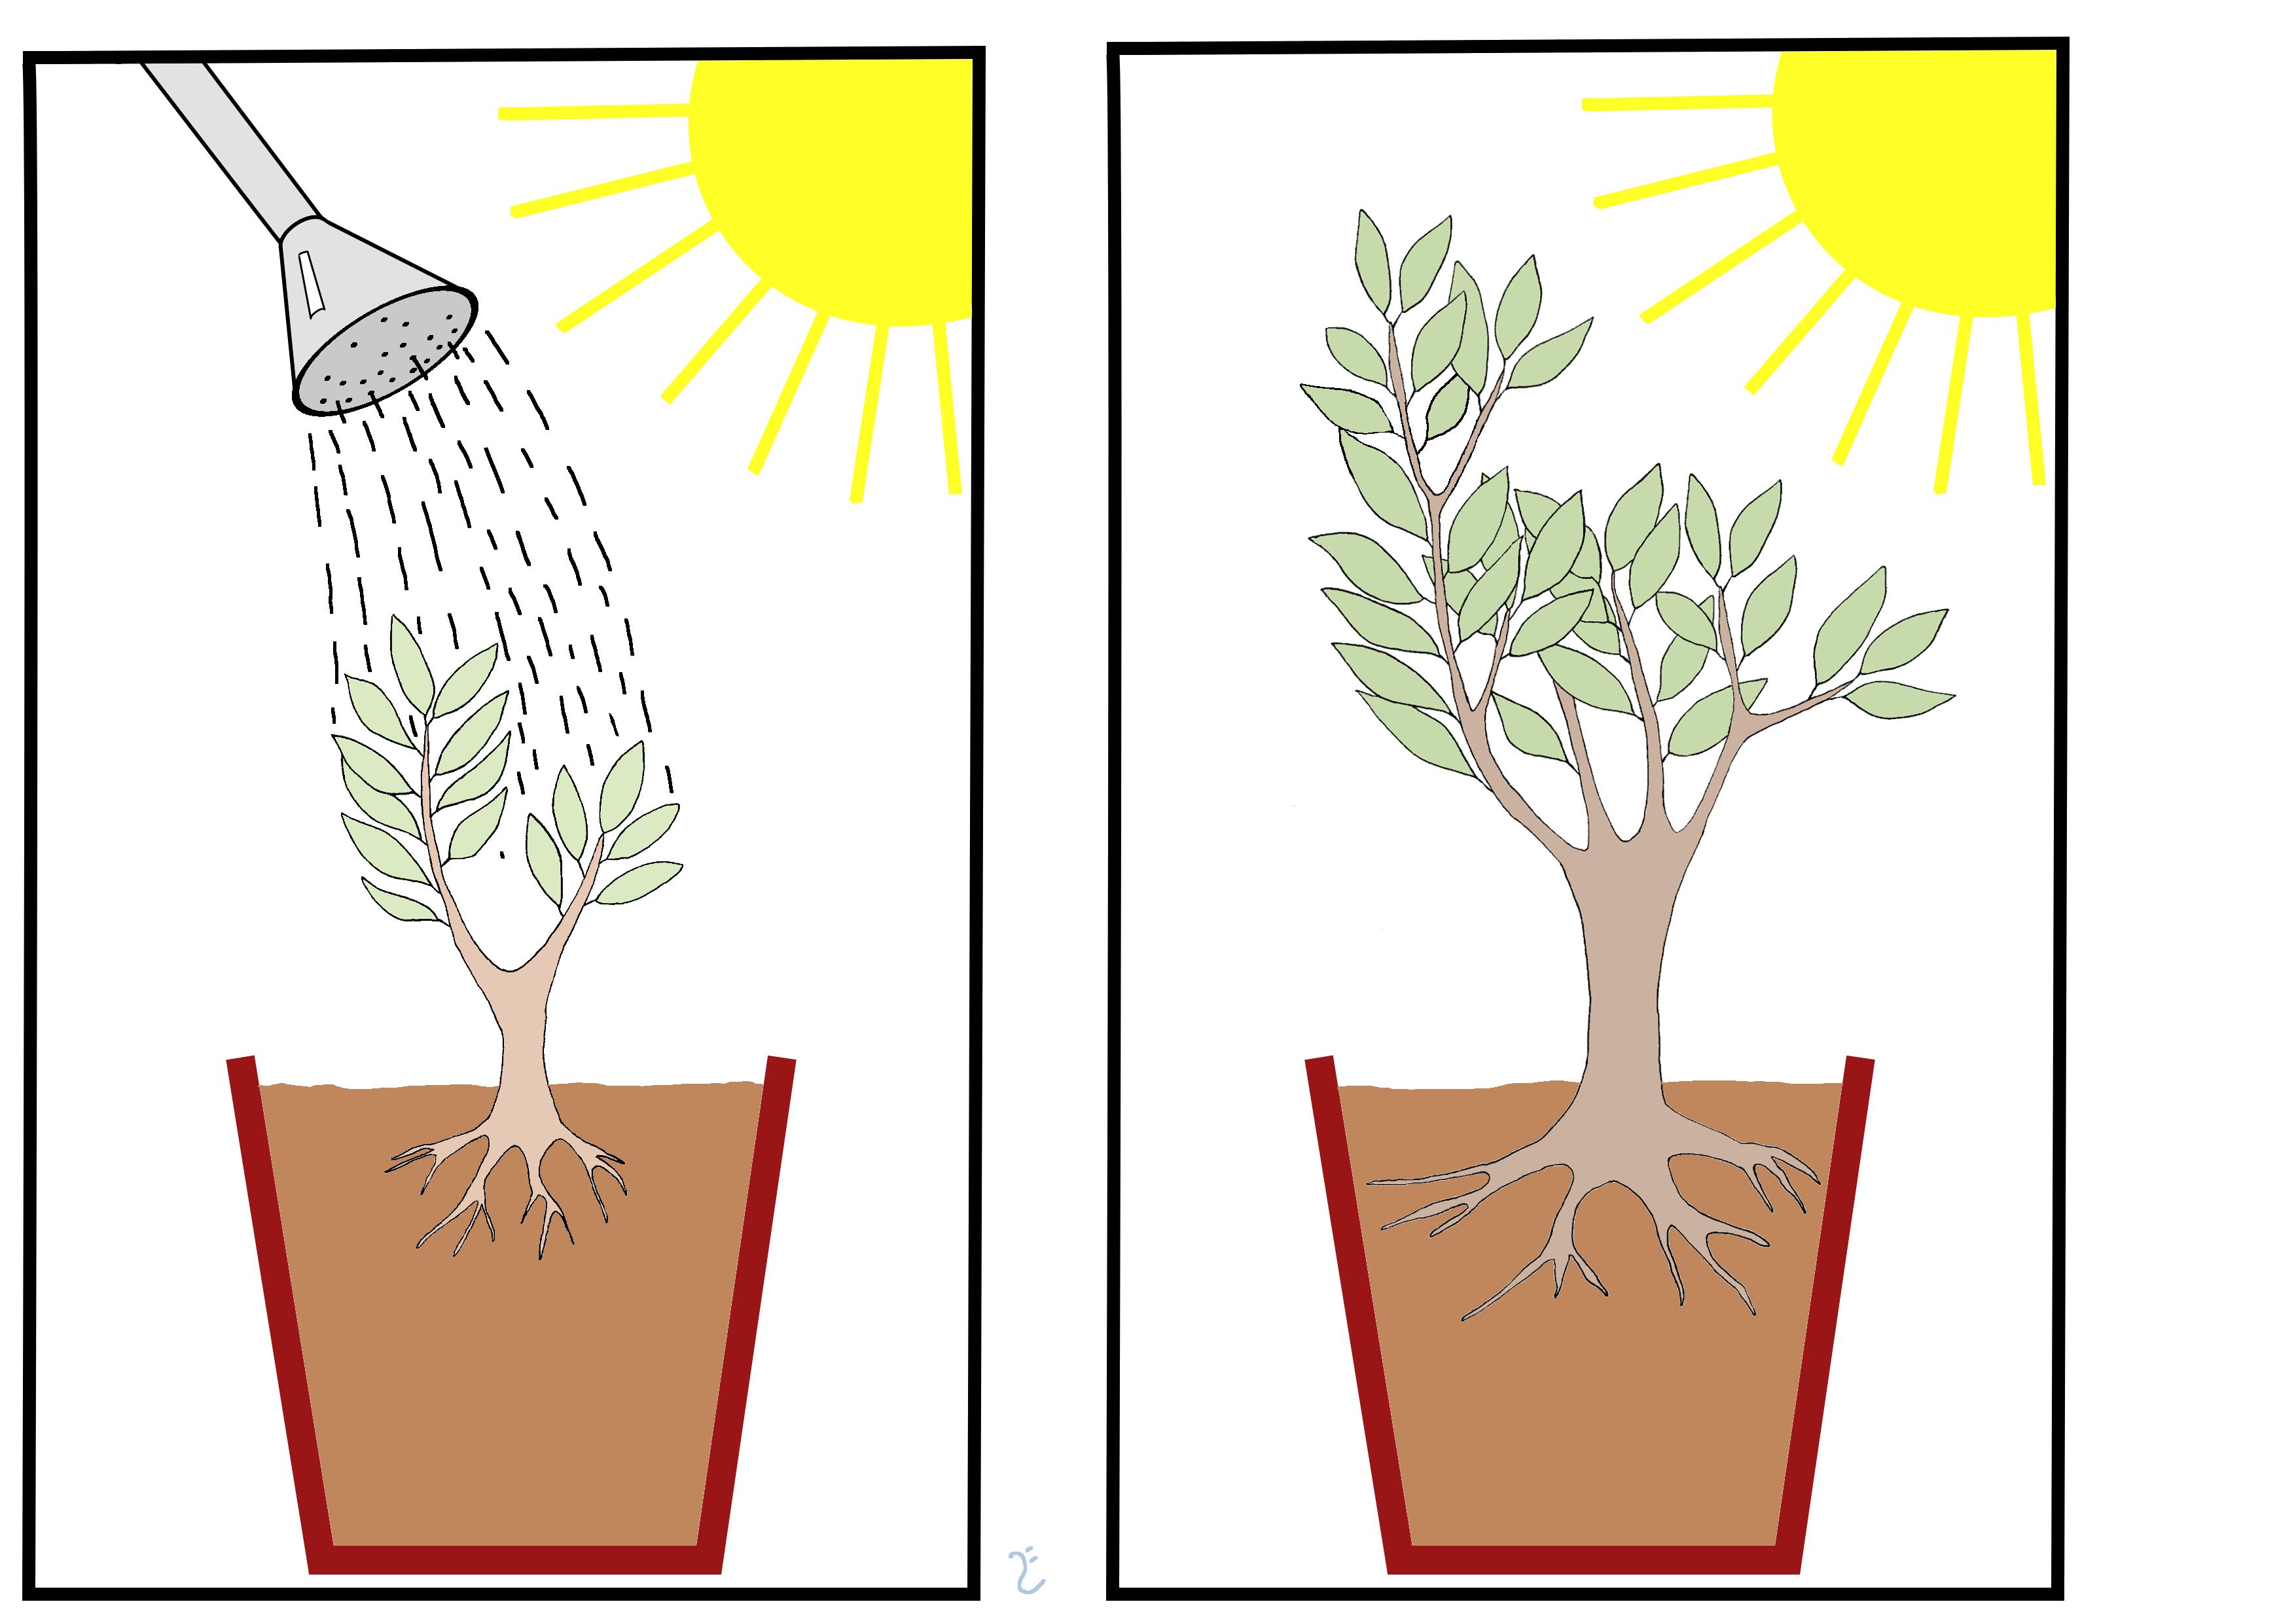 How Do Trees Get Their Mass?